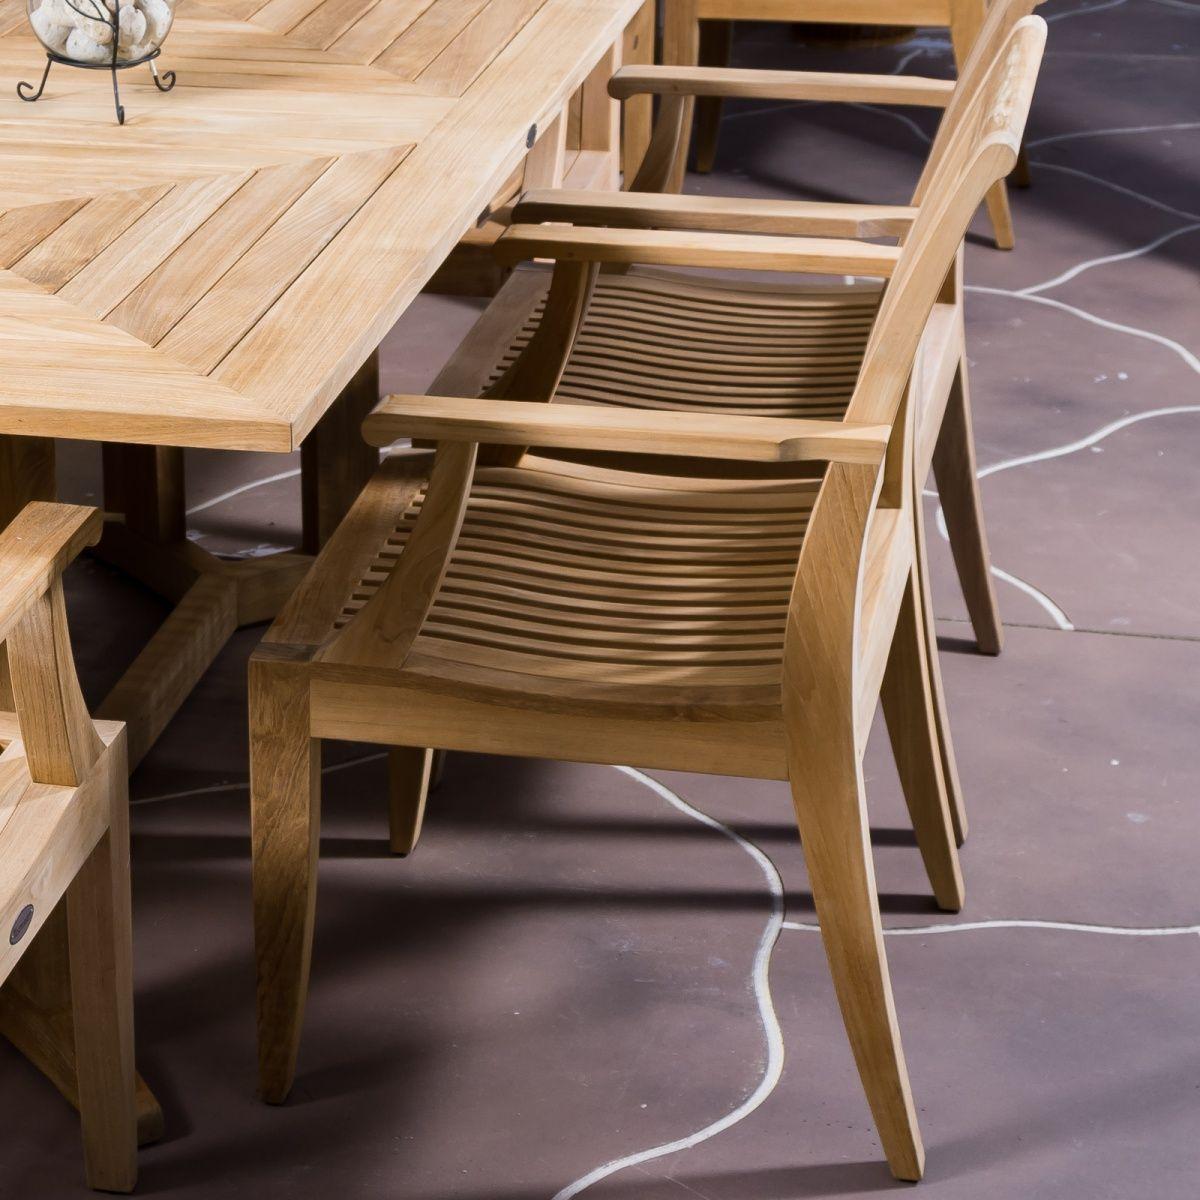 Laguna Teak Wood Dining Chair with Arms